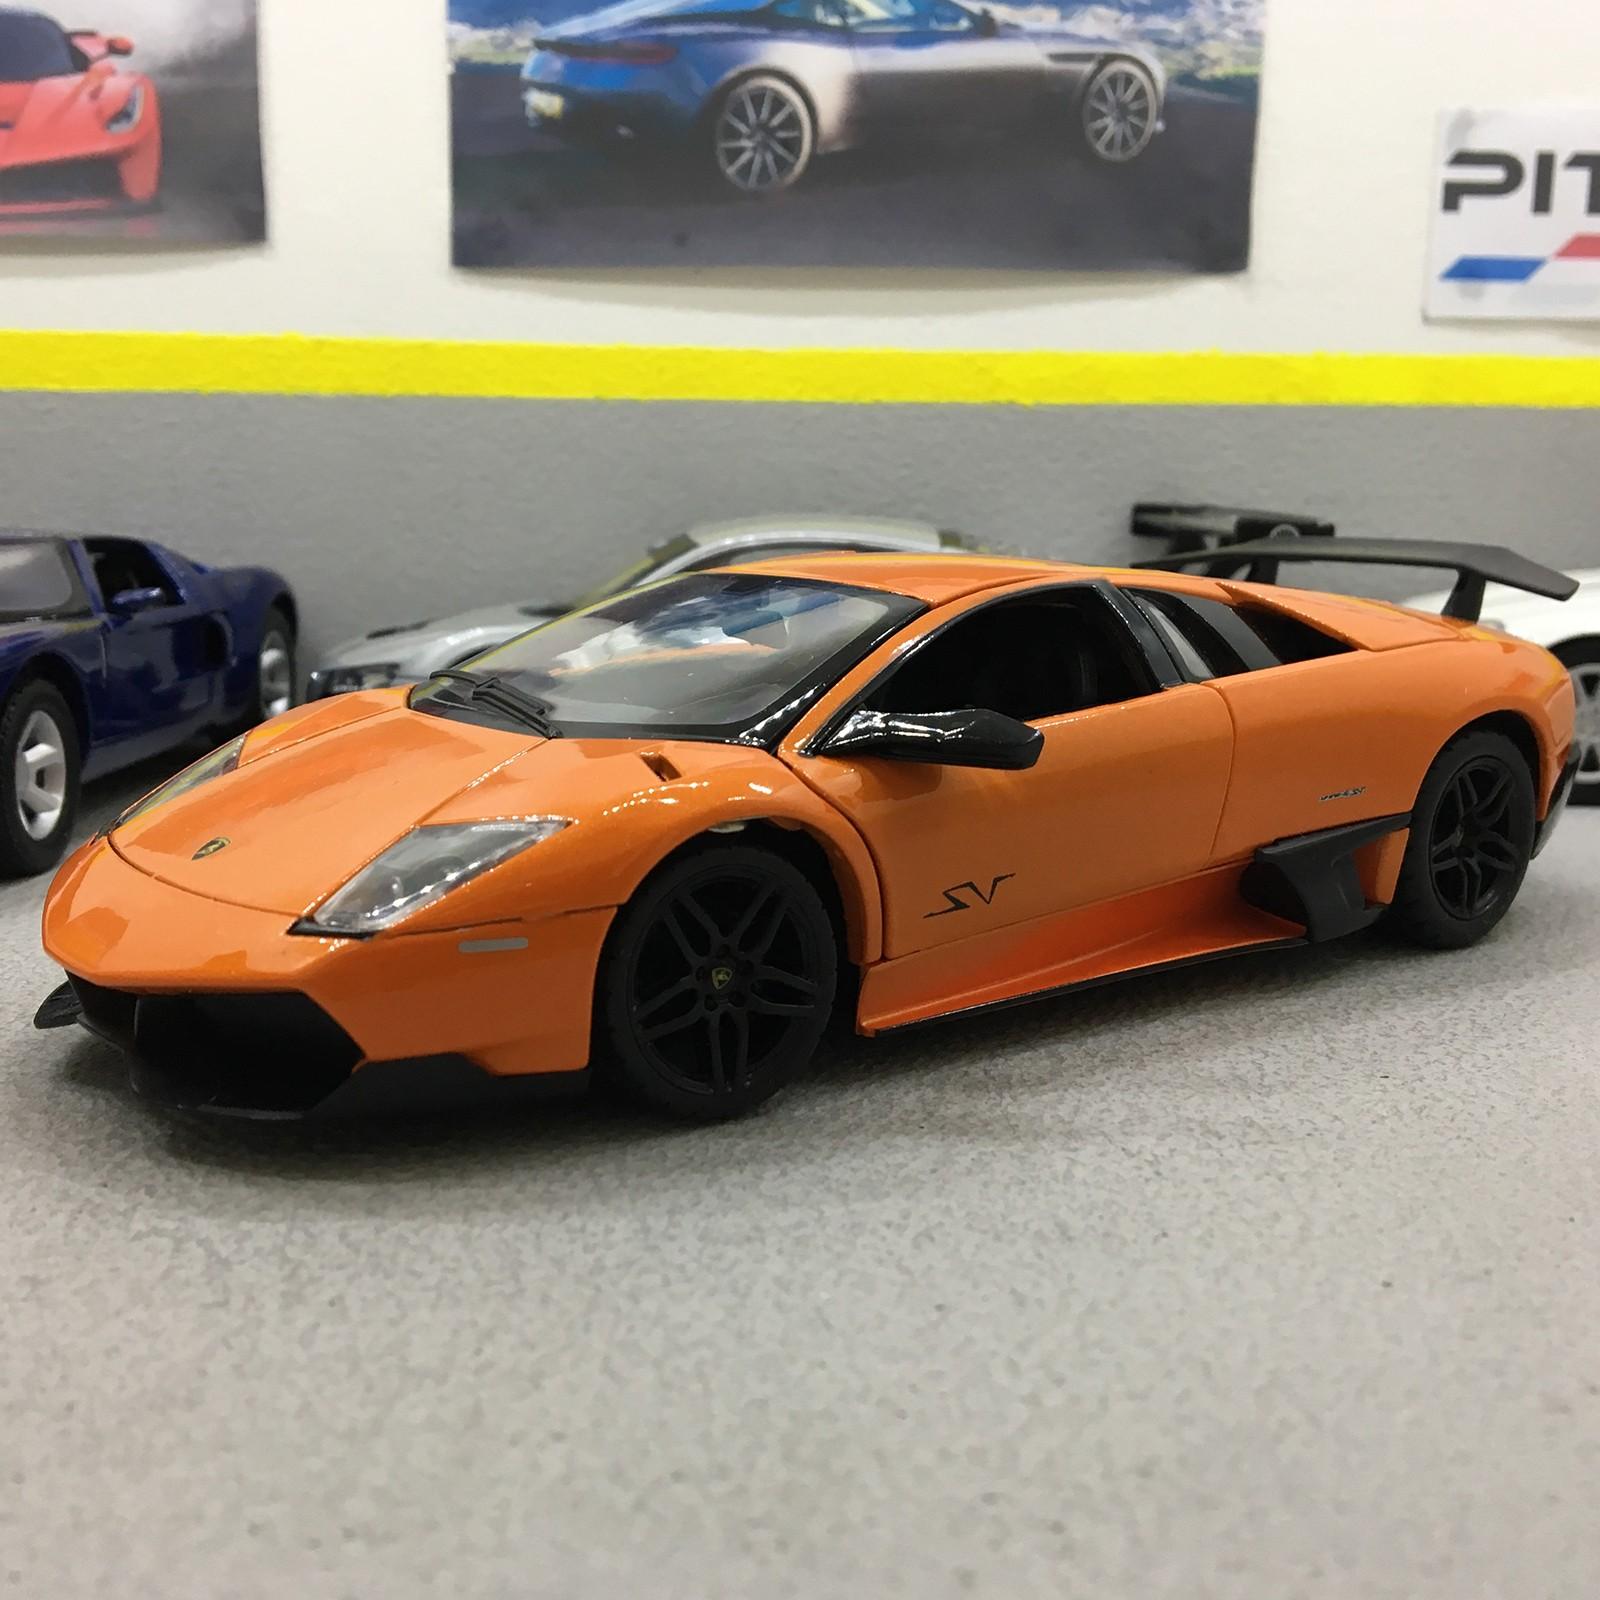 Murcielago Lp670 4 Sv Orange 1 24 Scale Die Cast Model Car